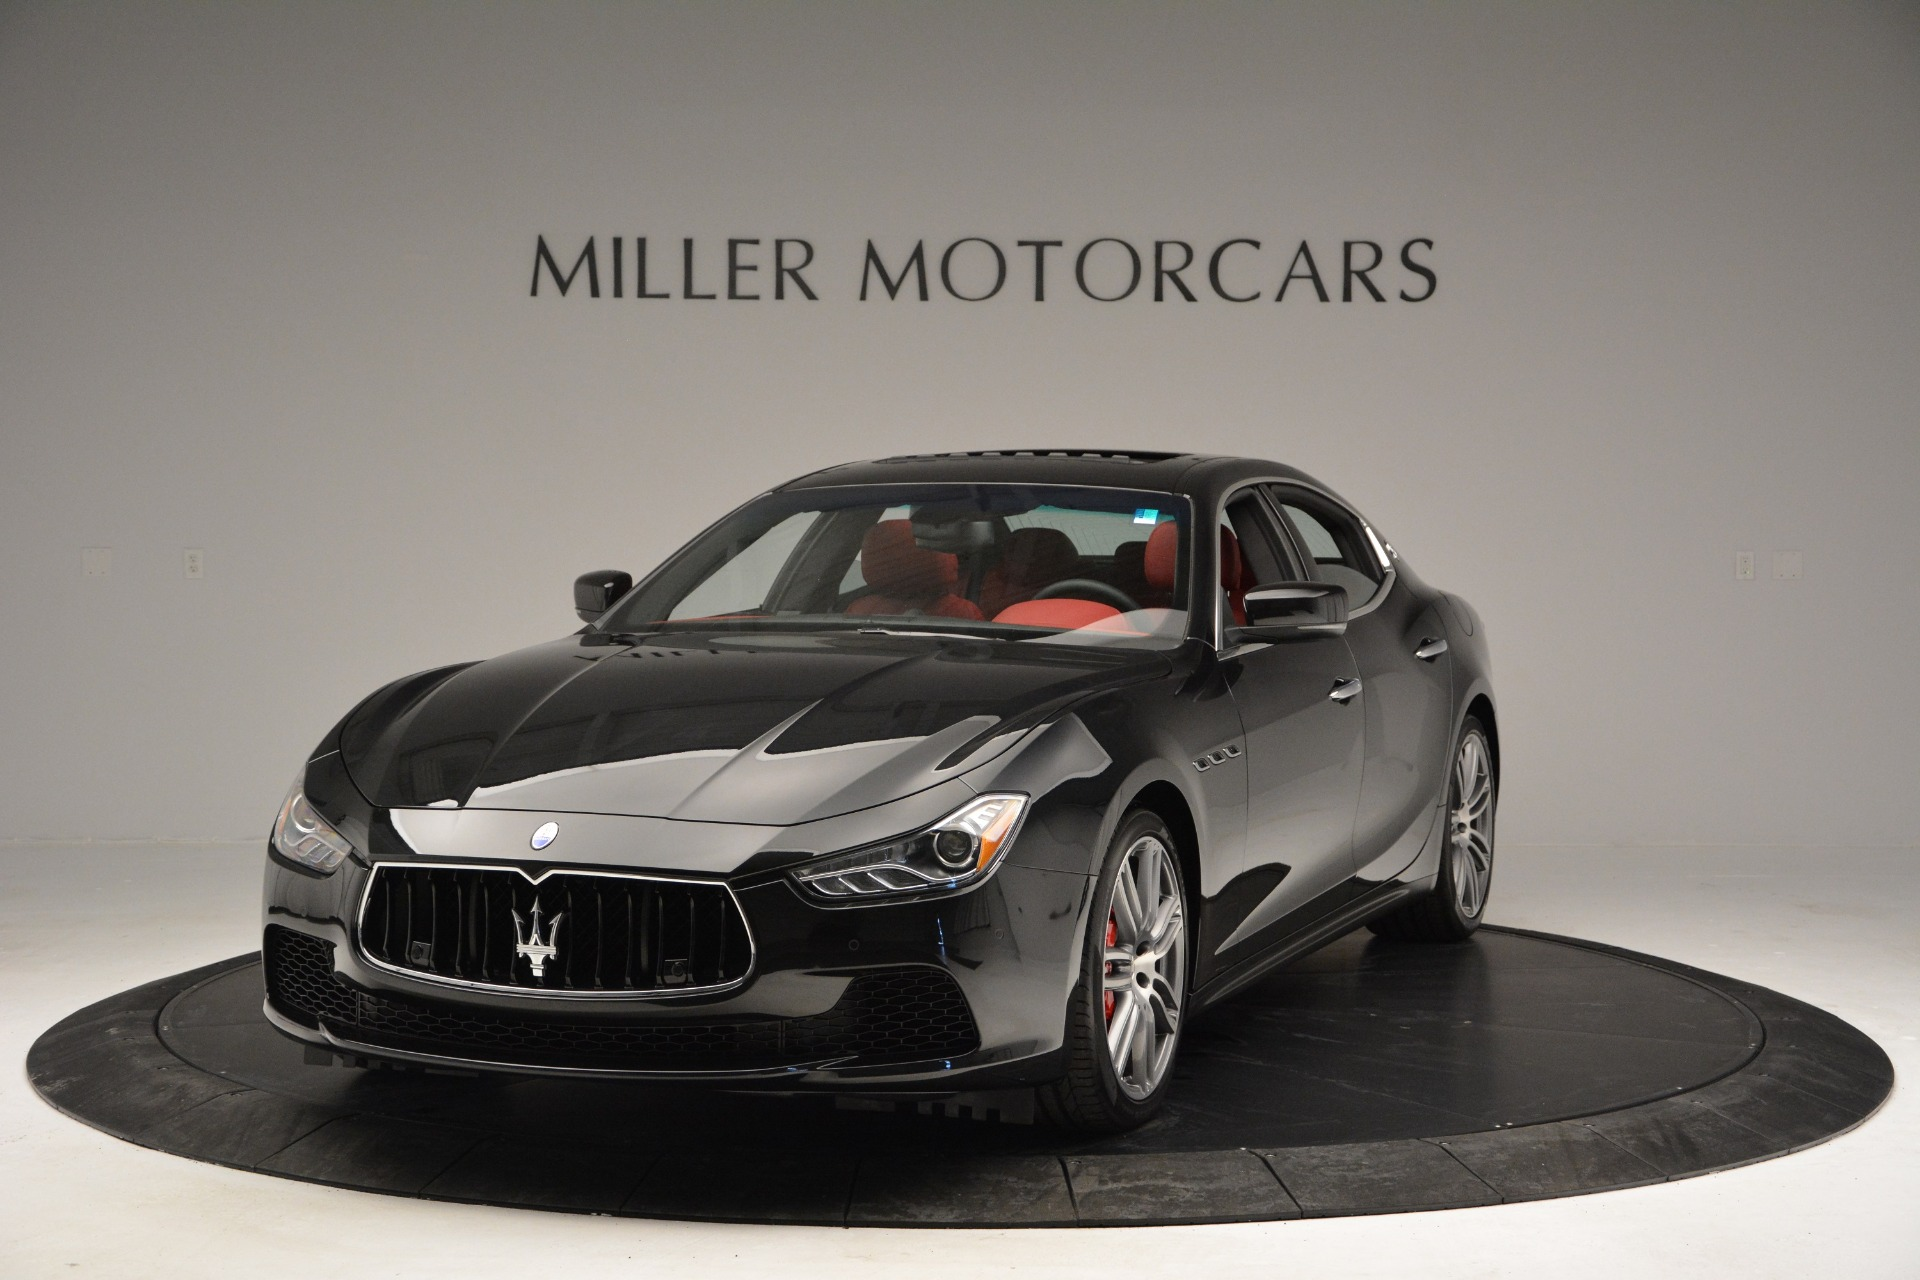 New 2017 Maserati Ghibli S Q4 For Sale In Greenwich, CT 610_main